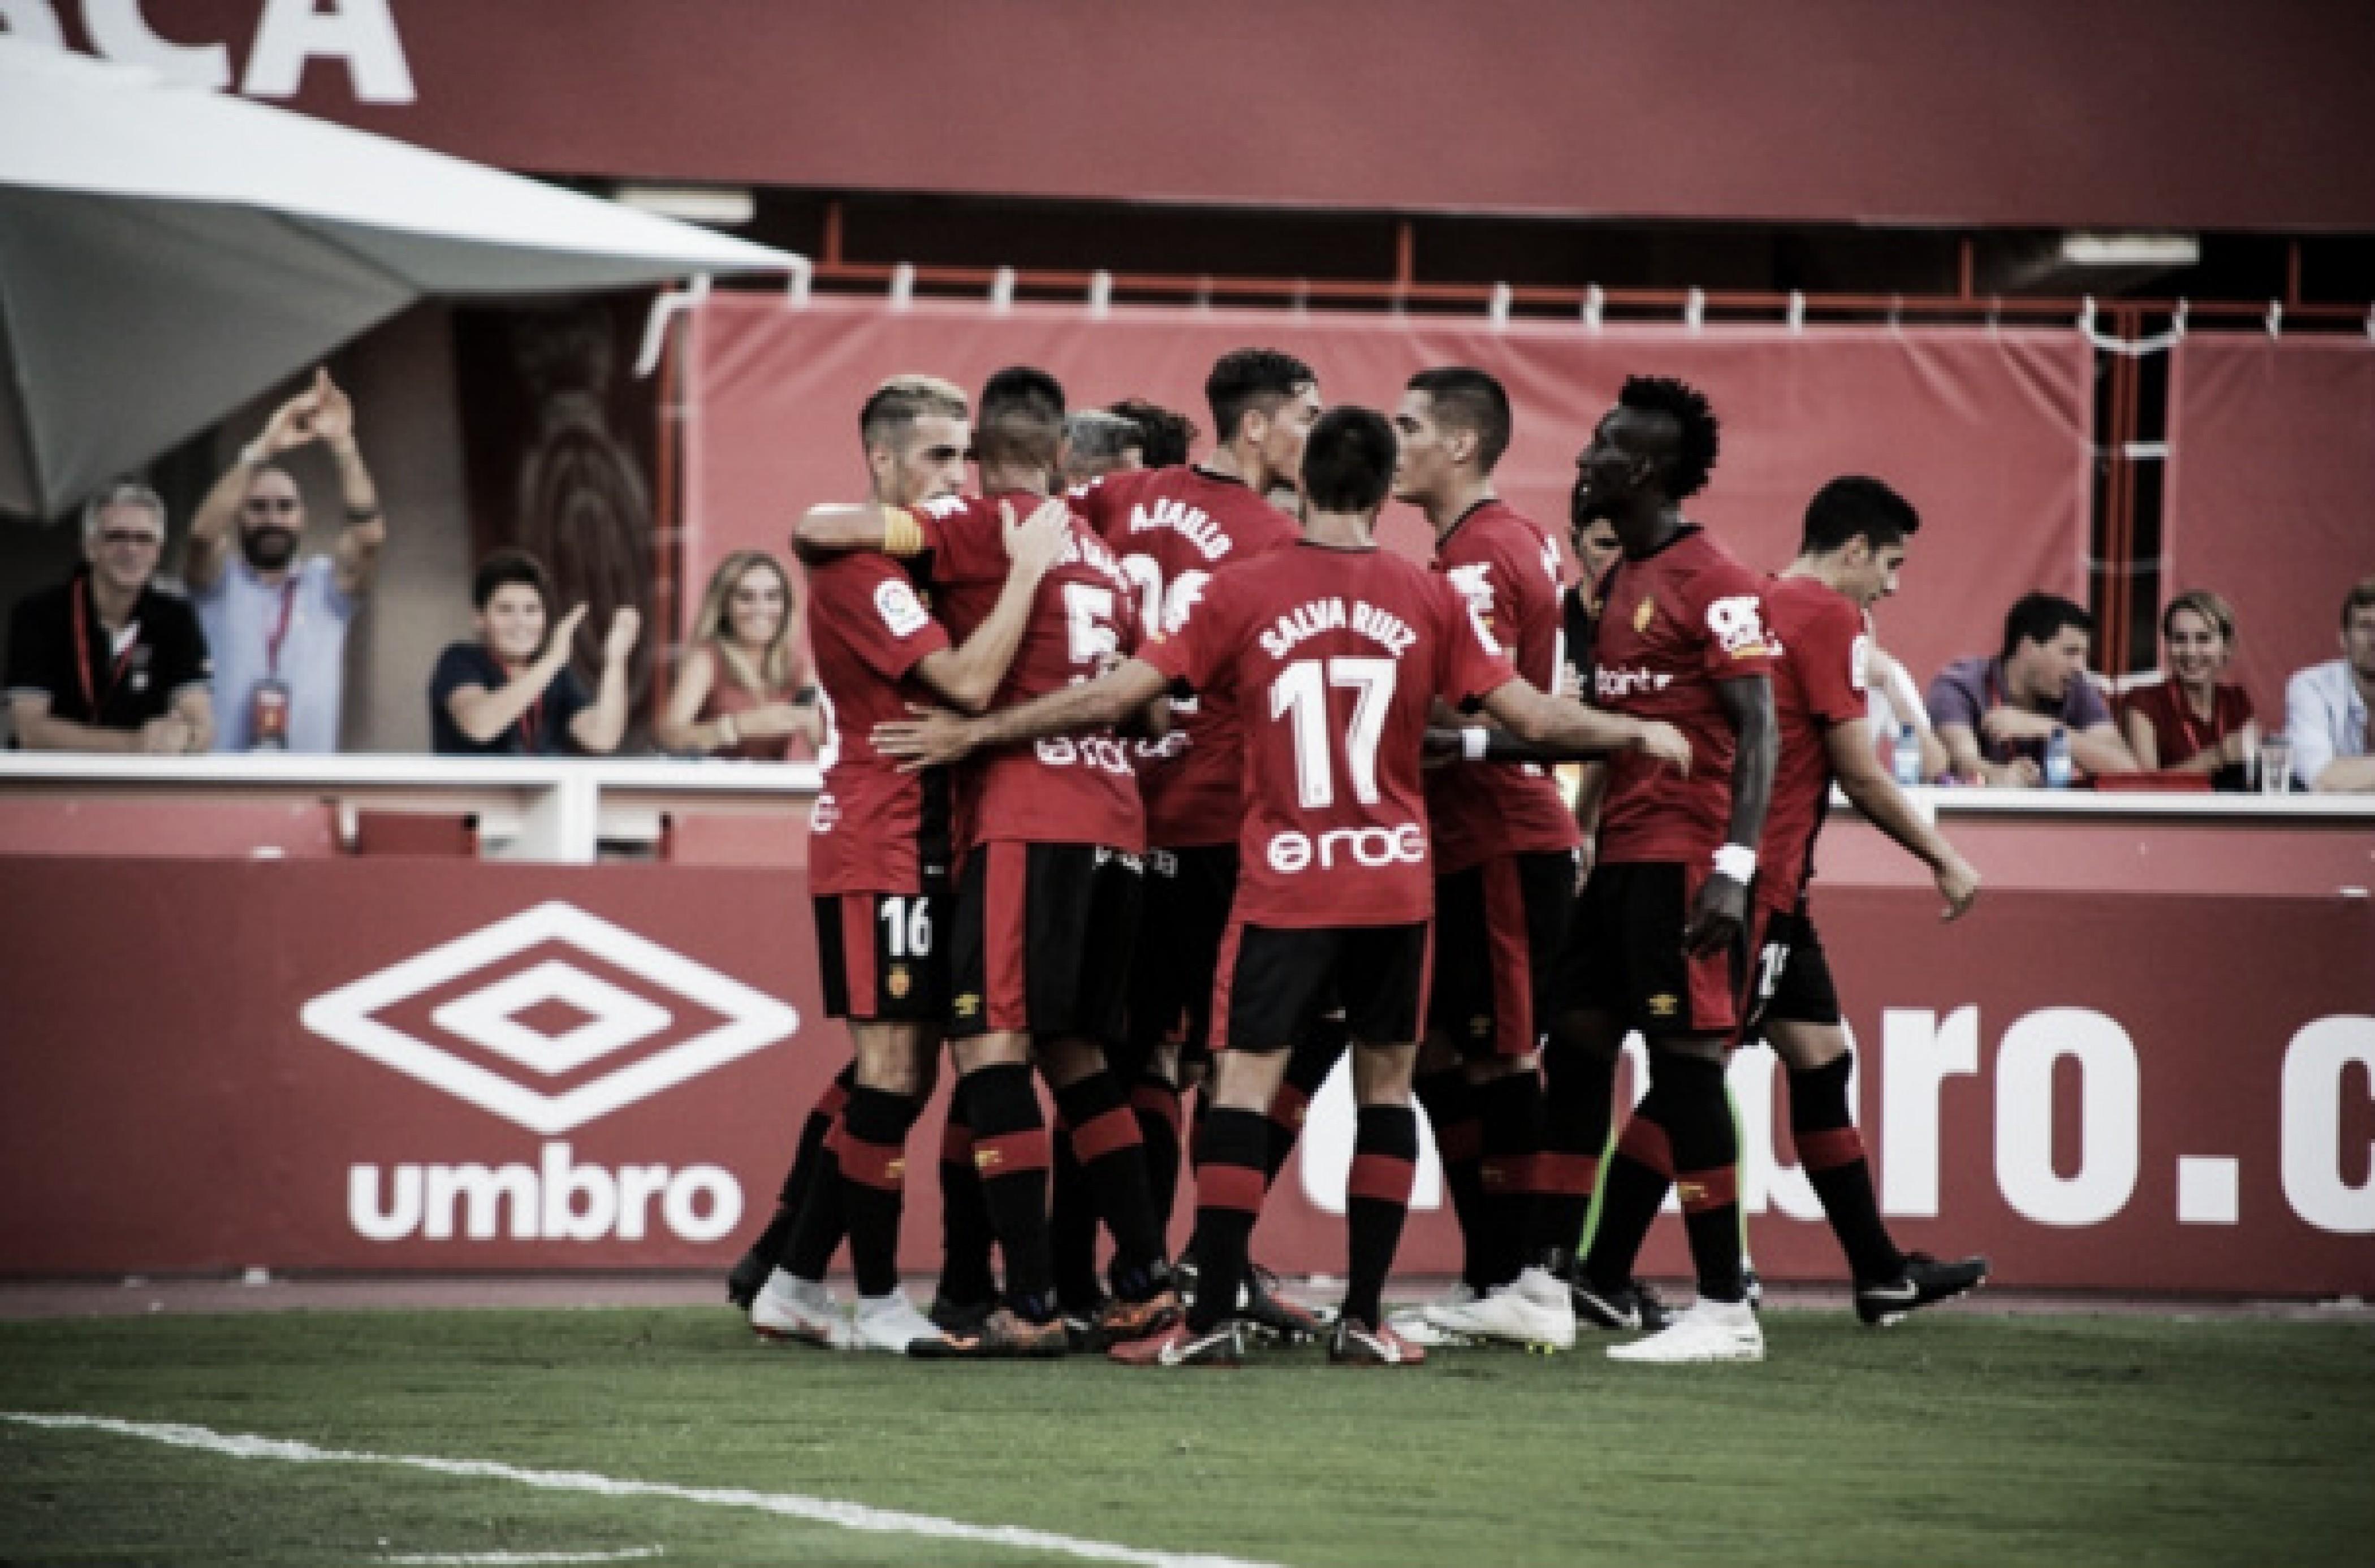 Previa RCD Mallorca - Albacete: dos revelaciones, frente a frente